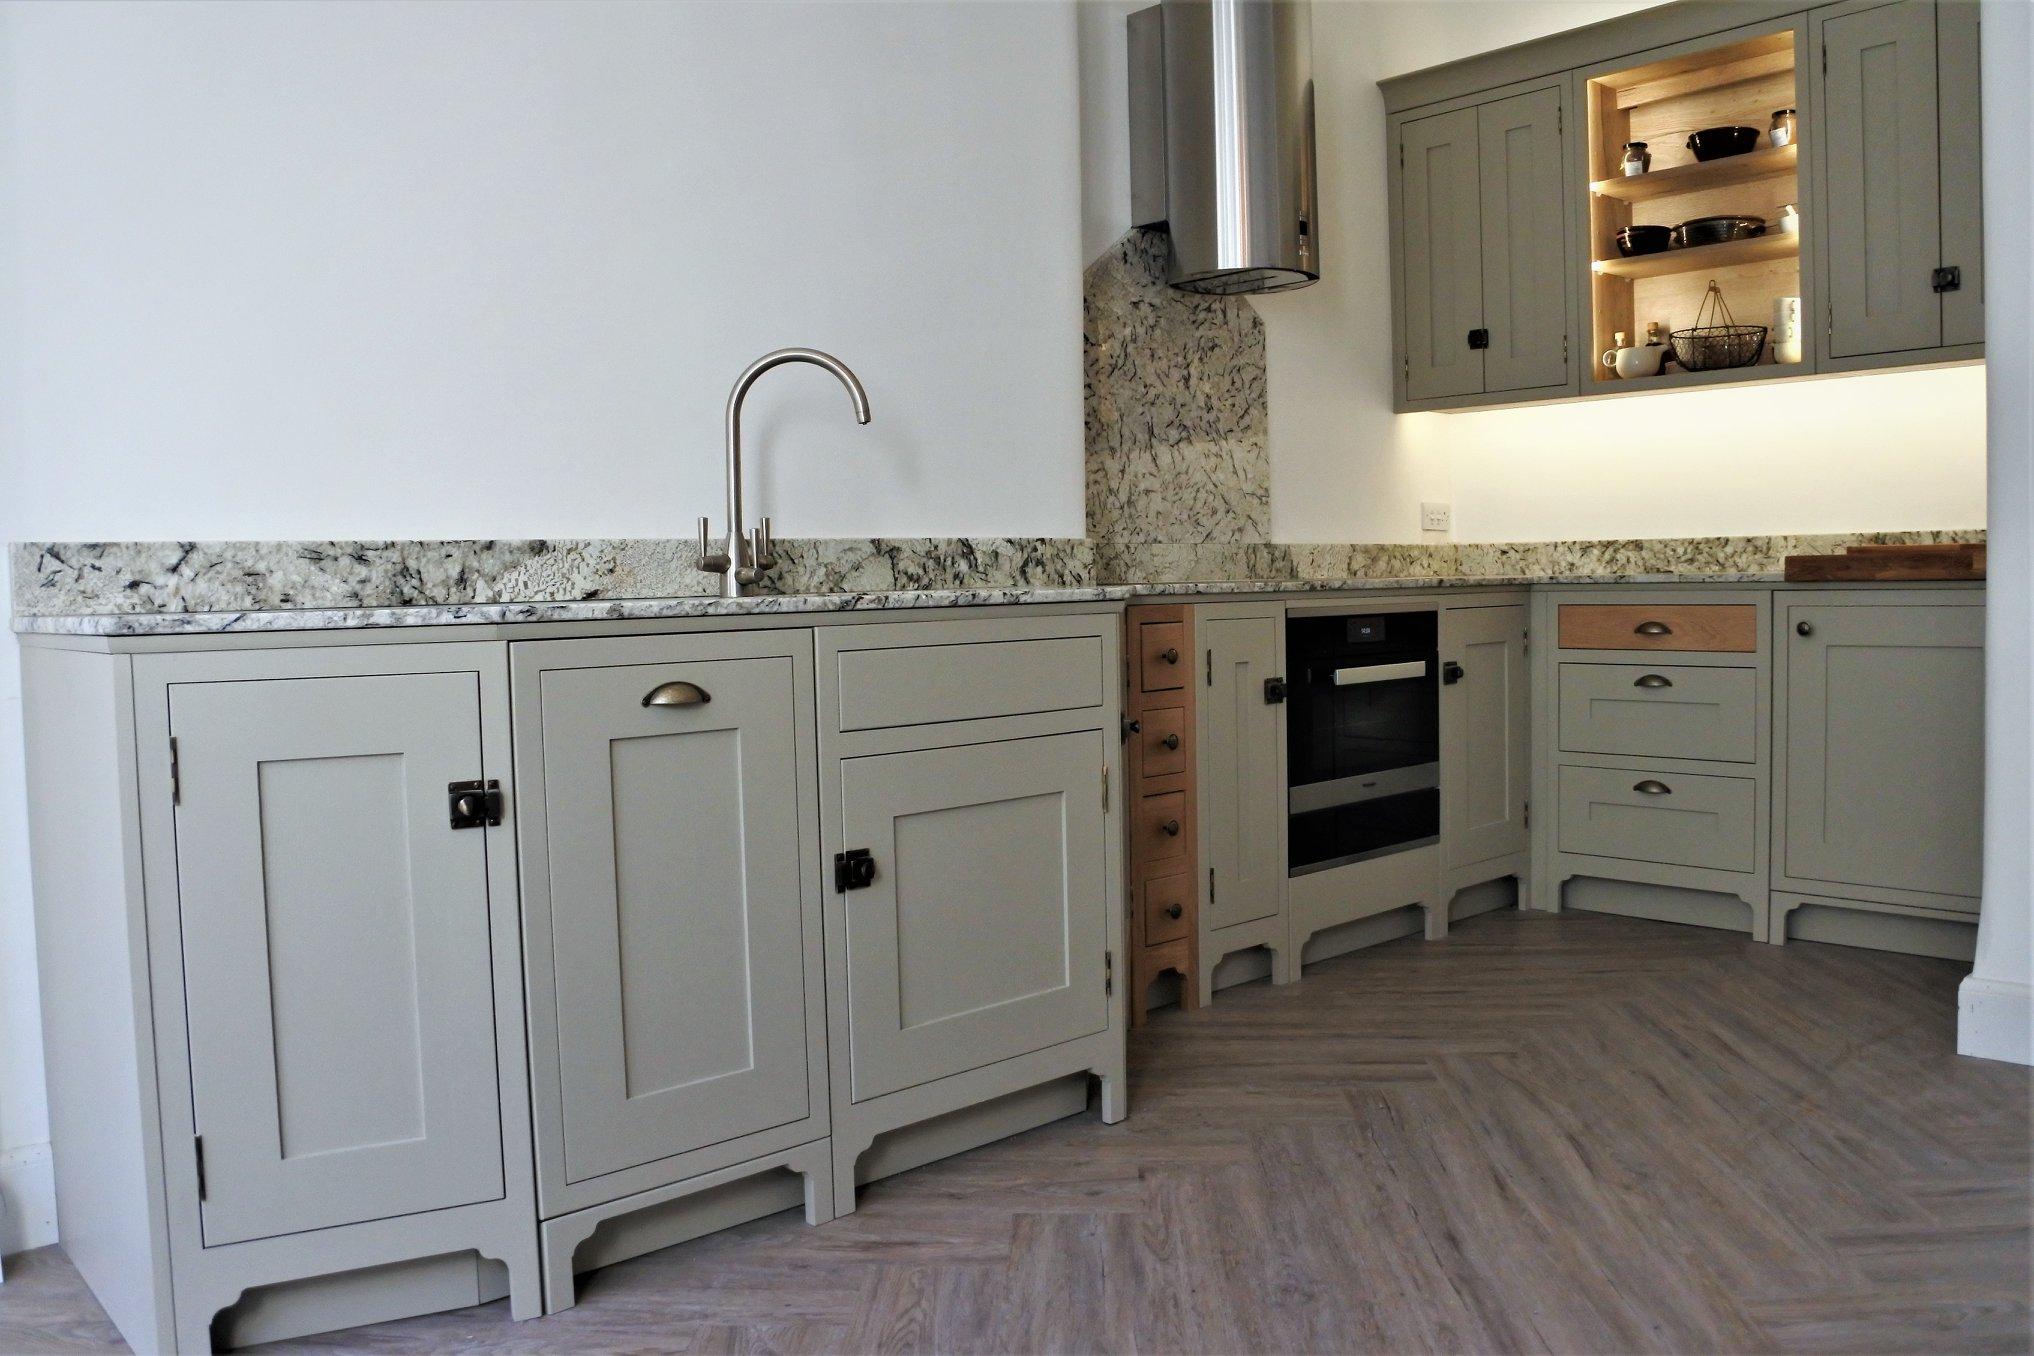 glasgow-bespoke-kitchens-main